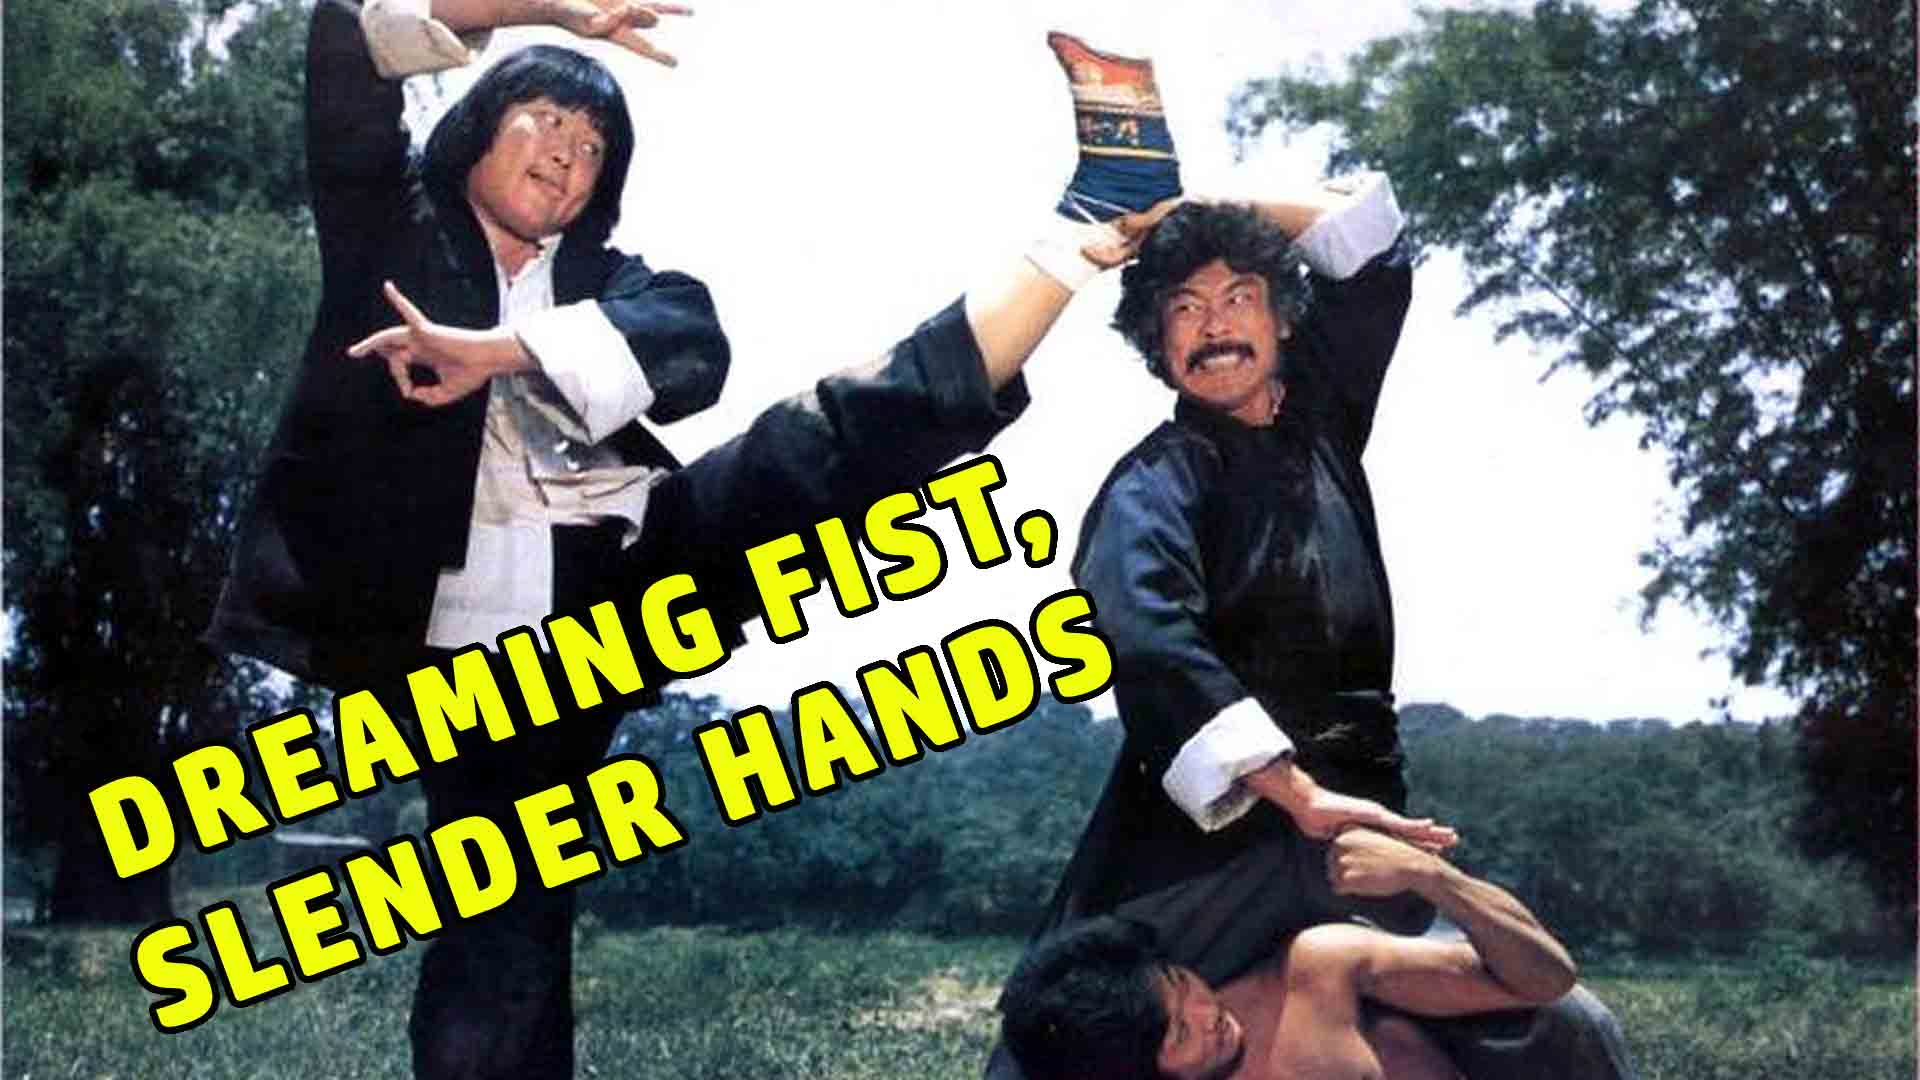 Dreaming Fist, Slender Hands